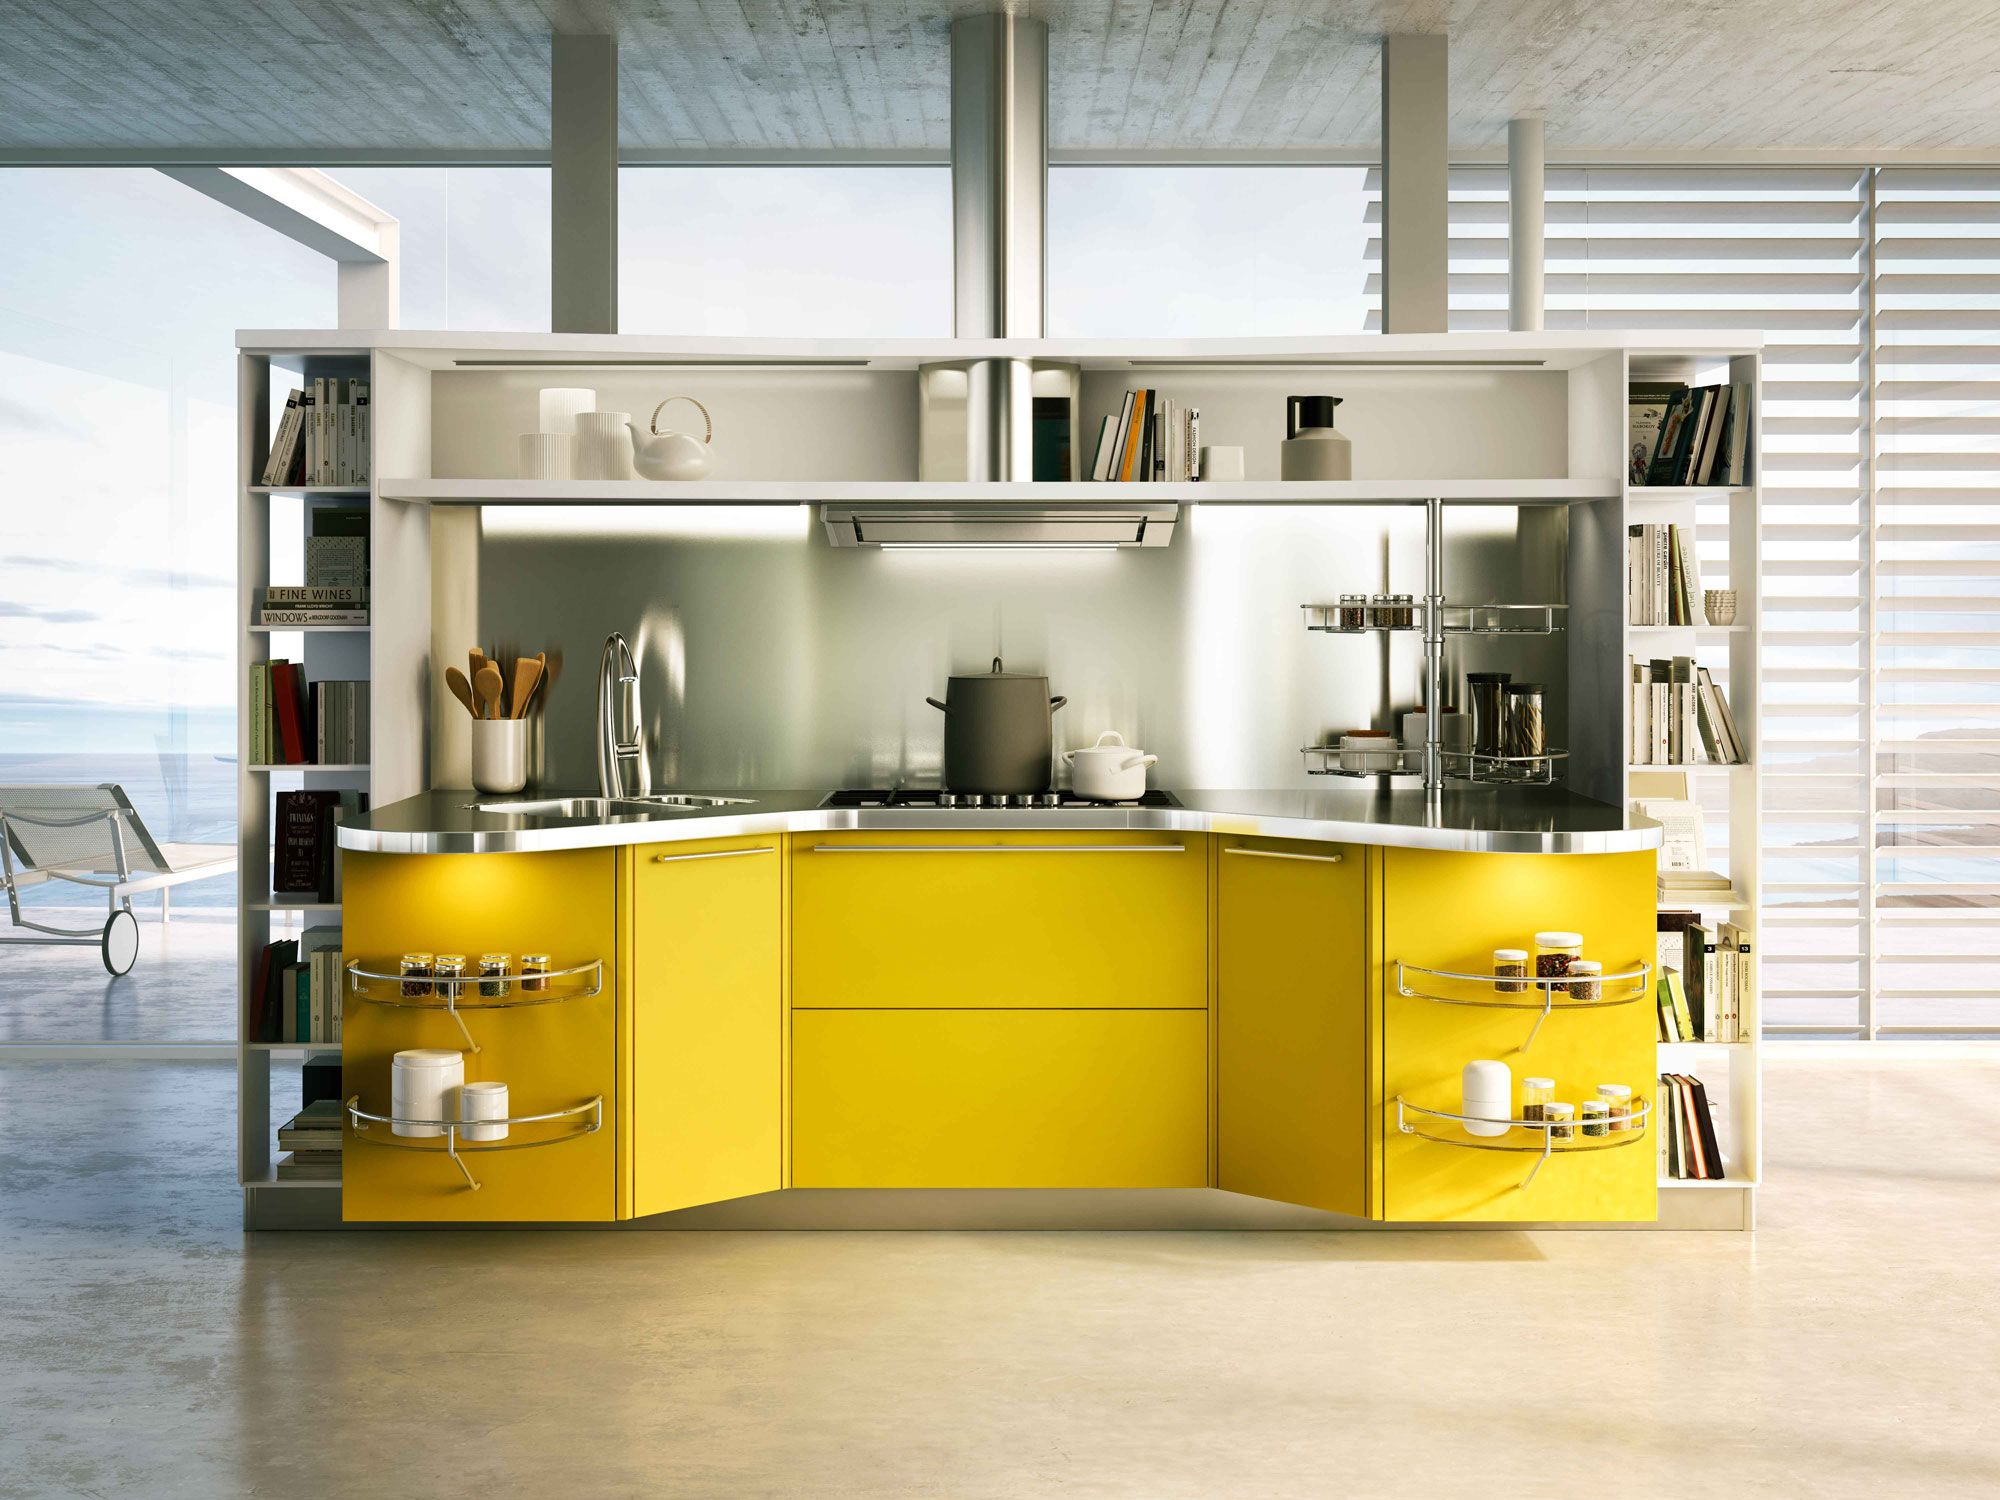 Snaidero cucina moderna skyline 2.0 | Kitchen furniture ...